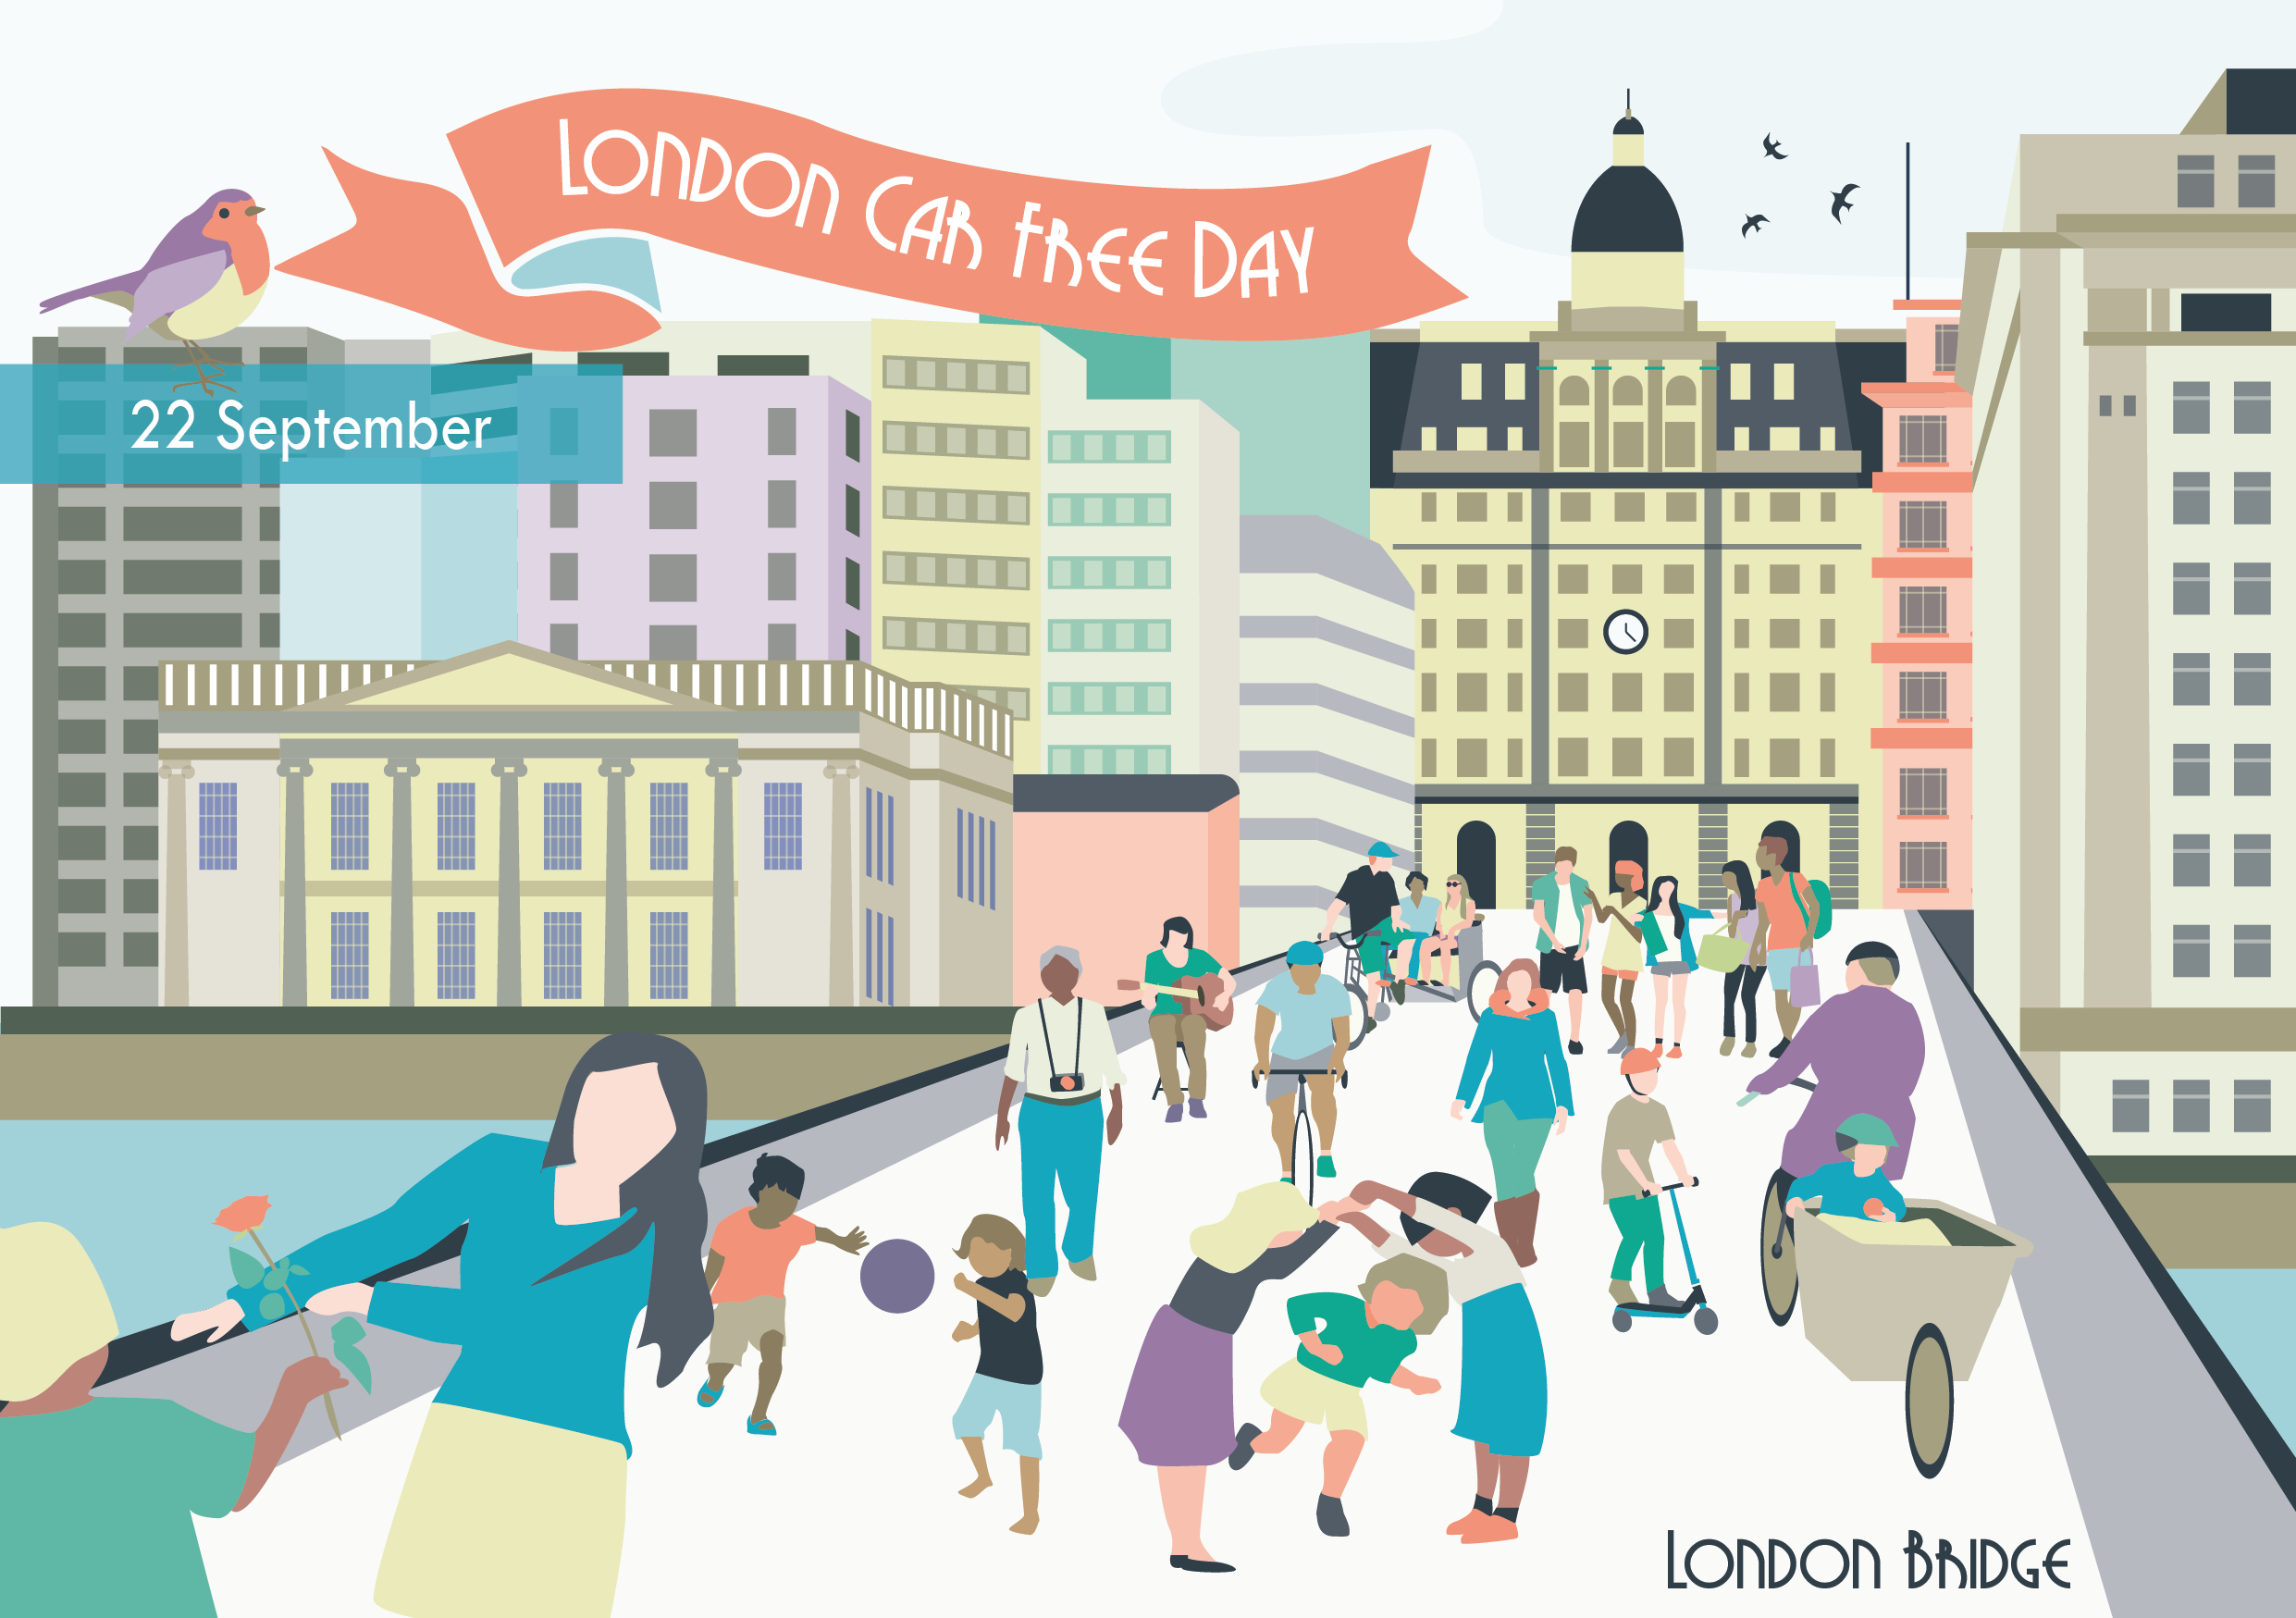 london_car_free_day_Postcards_7_Print-05.png